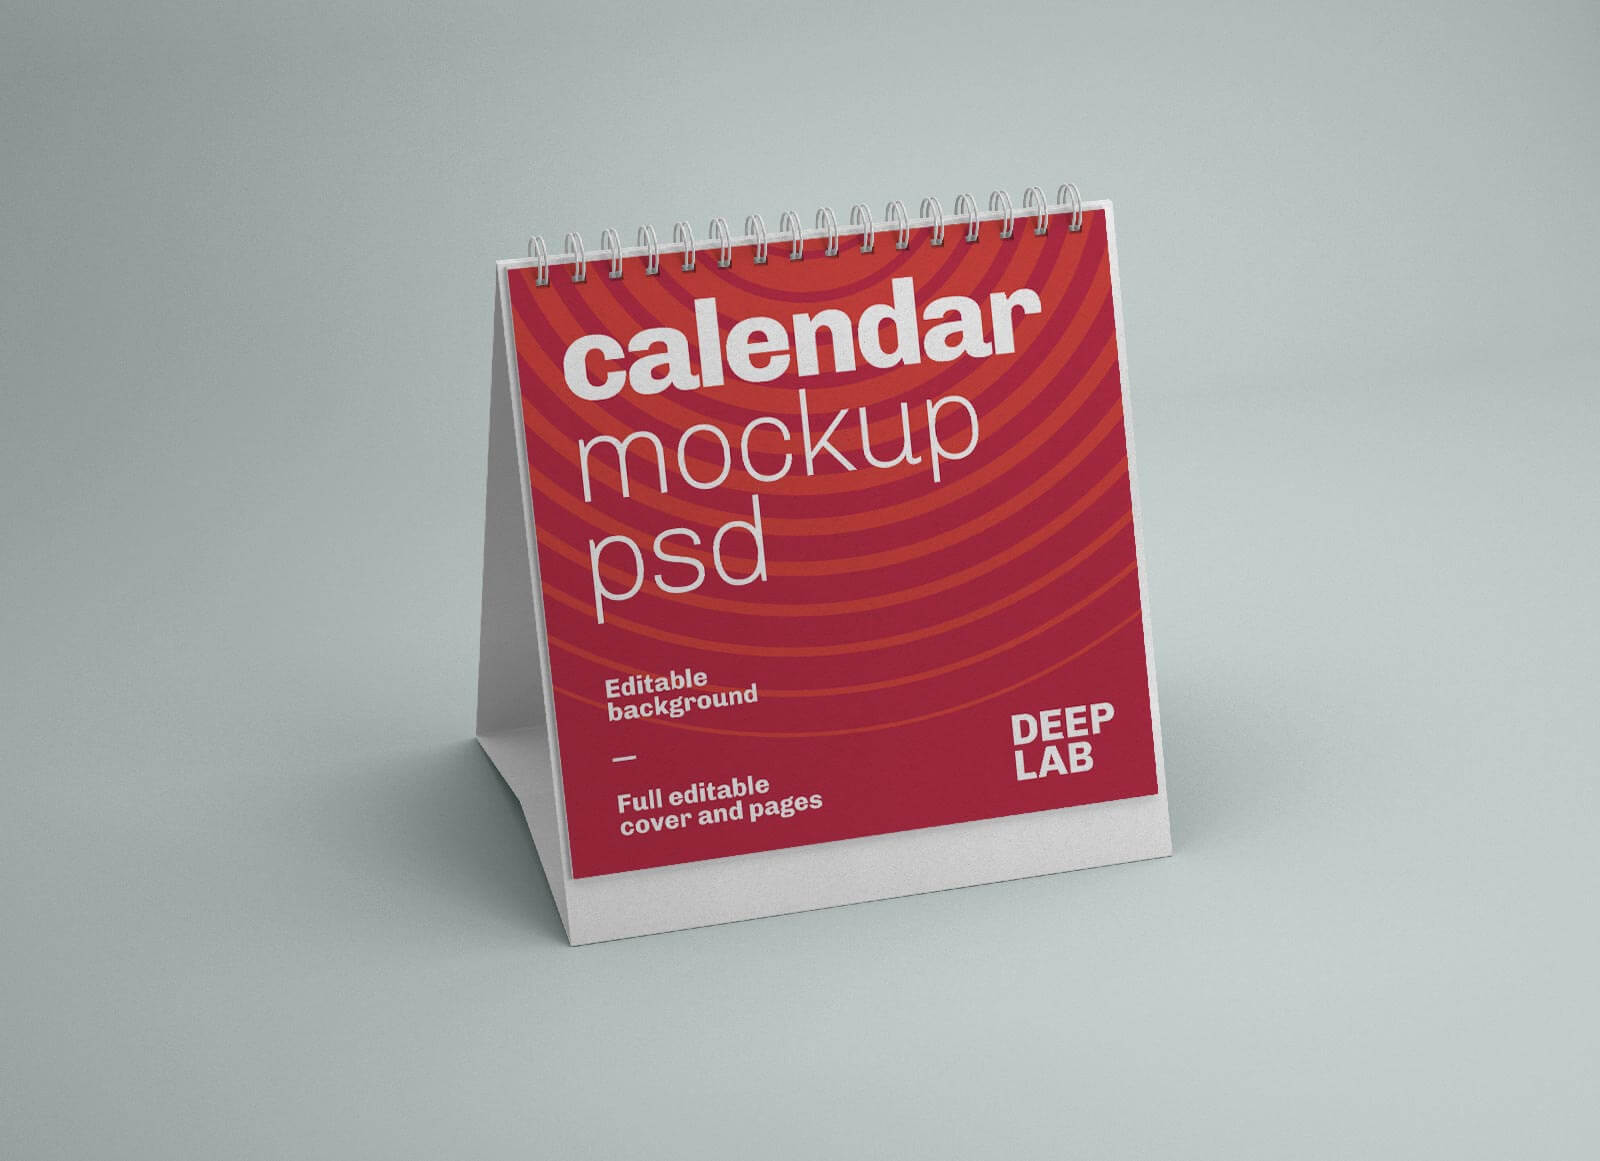 Free Square Desk Calendar 2022 Mockup PSD (3)